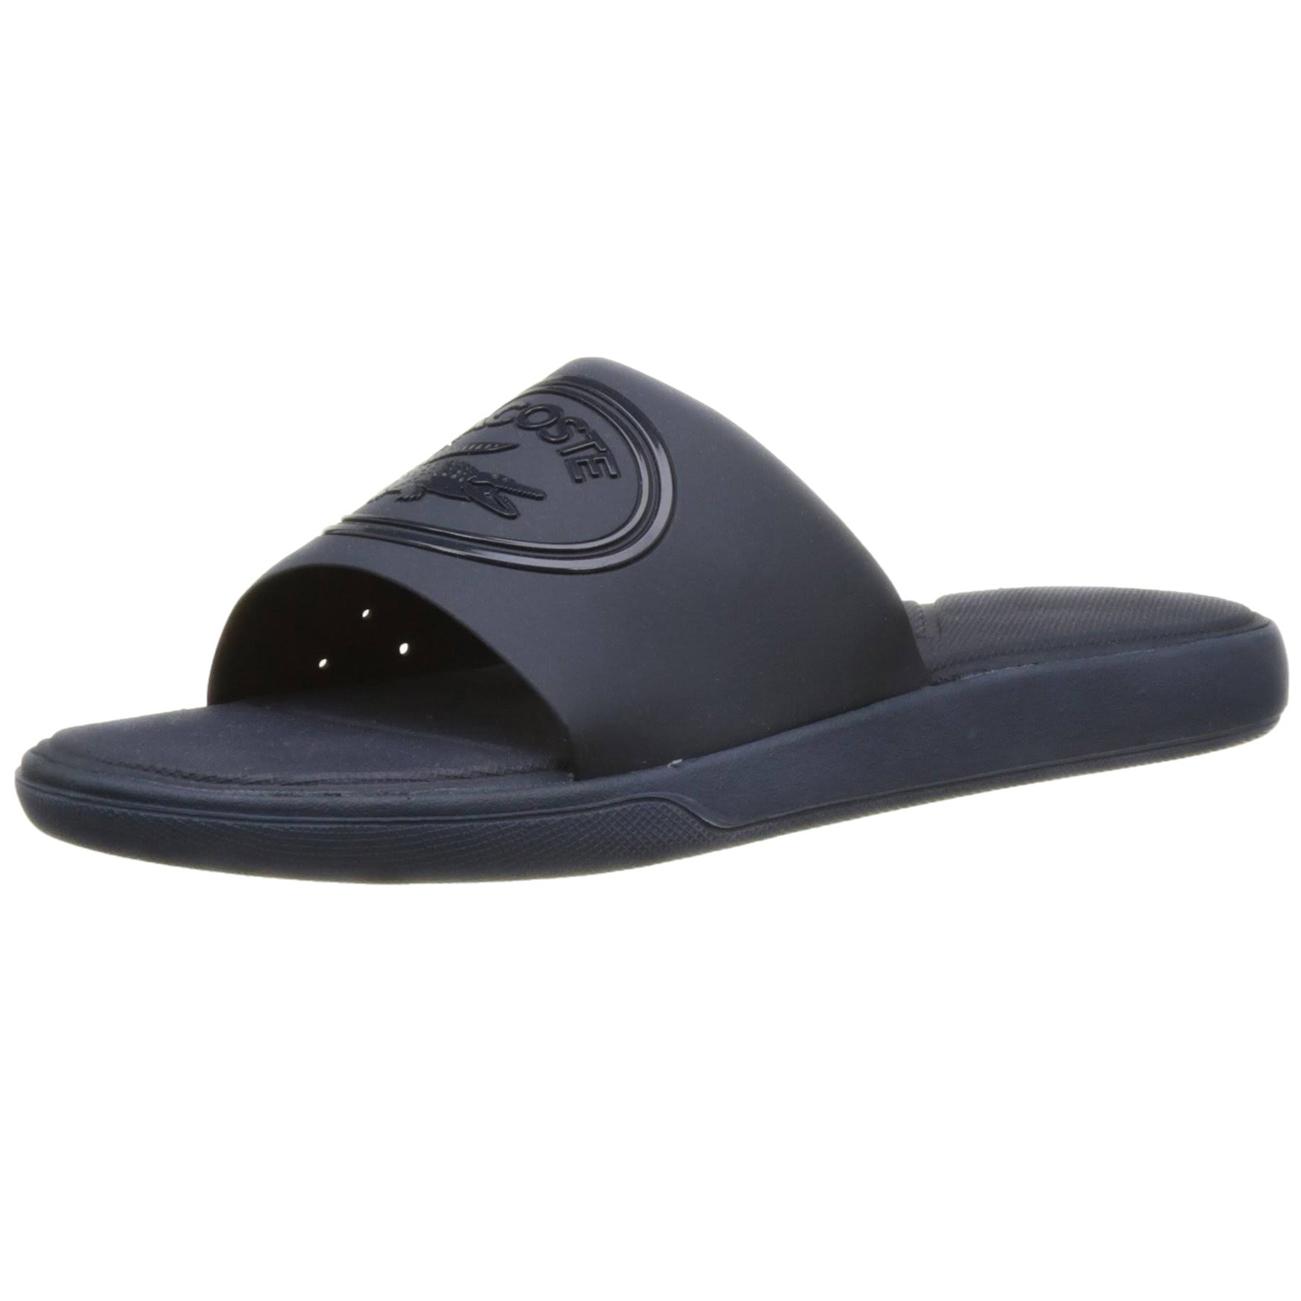 Womens Lacsote L.30 Slide 219 1 Cfa Open Toe Sliders Lightweight Sandals UK 3-8